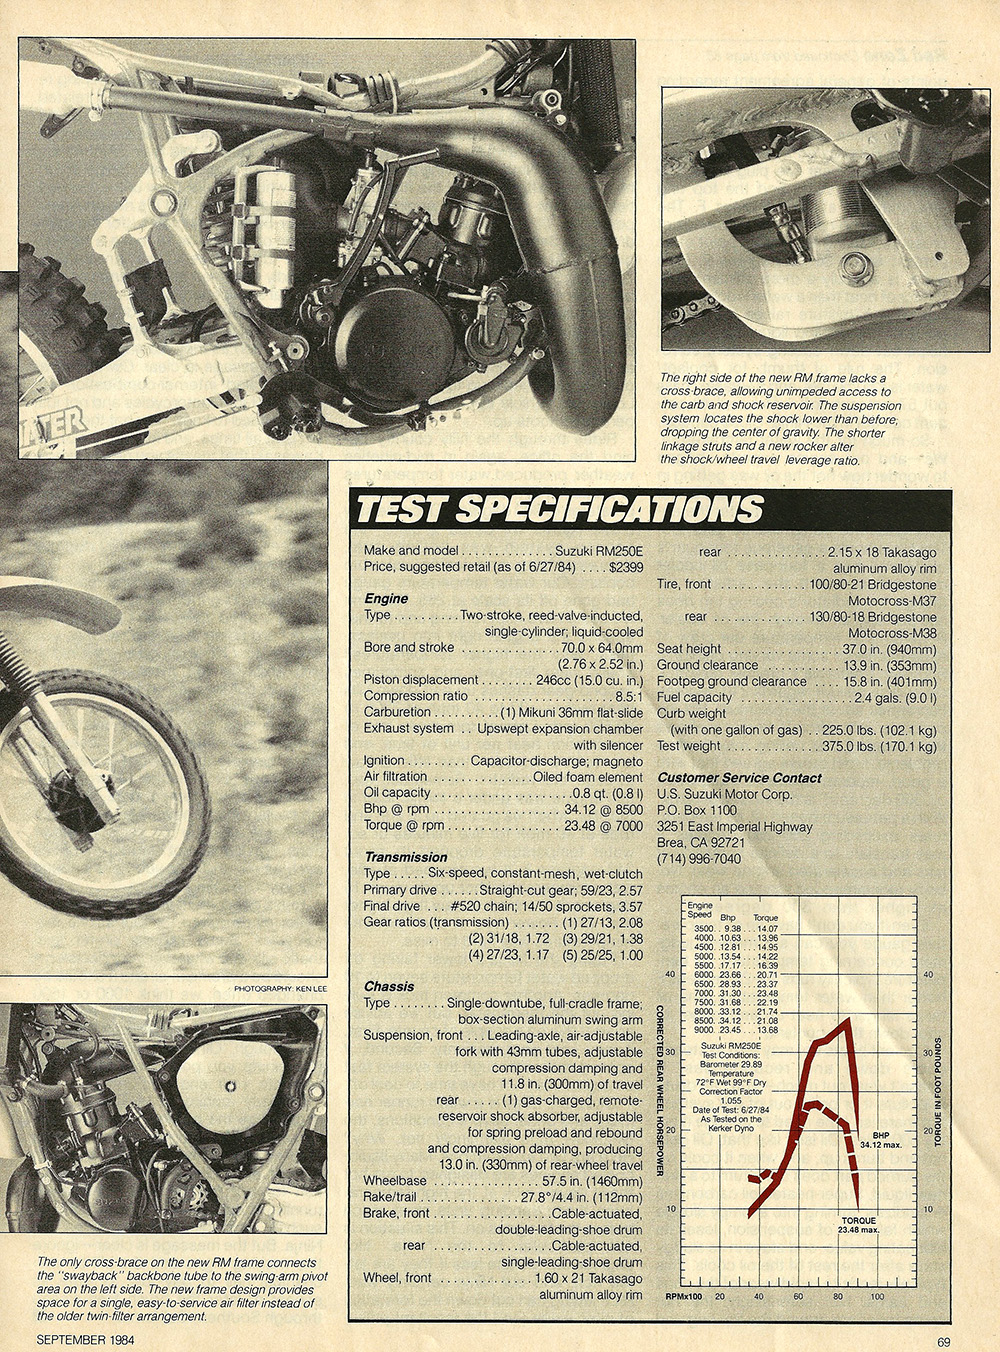 1984 Suzuki RM250 E road test 05.jpg